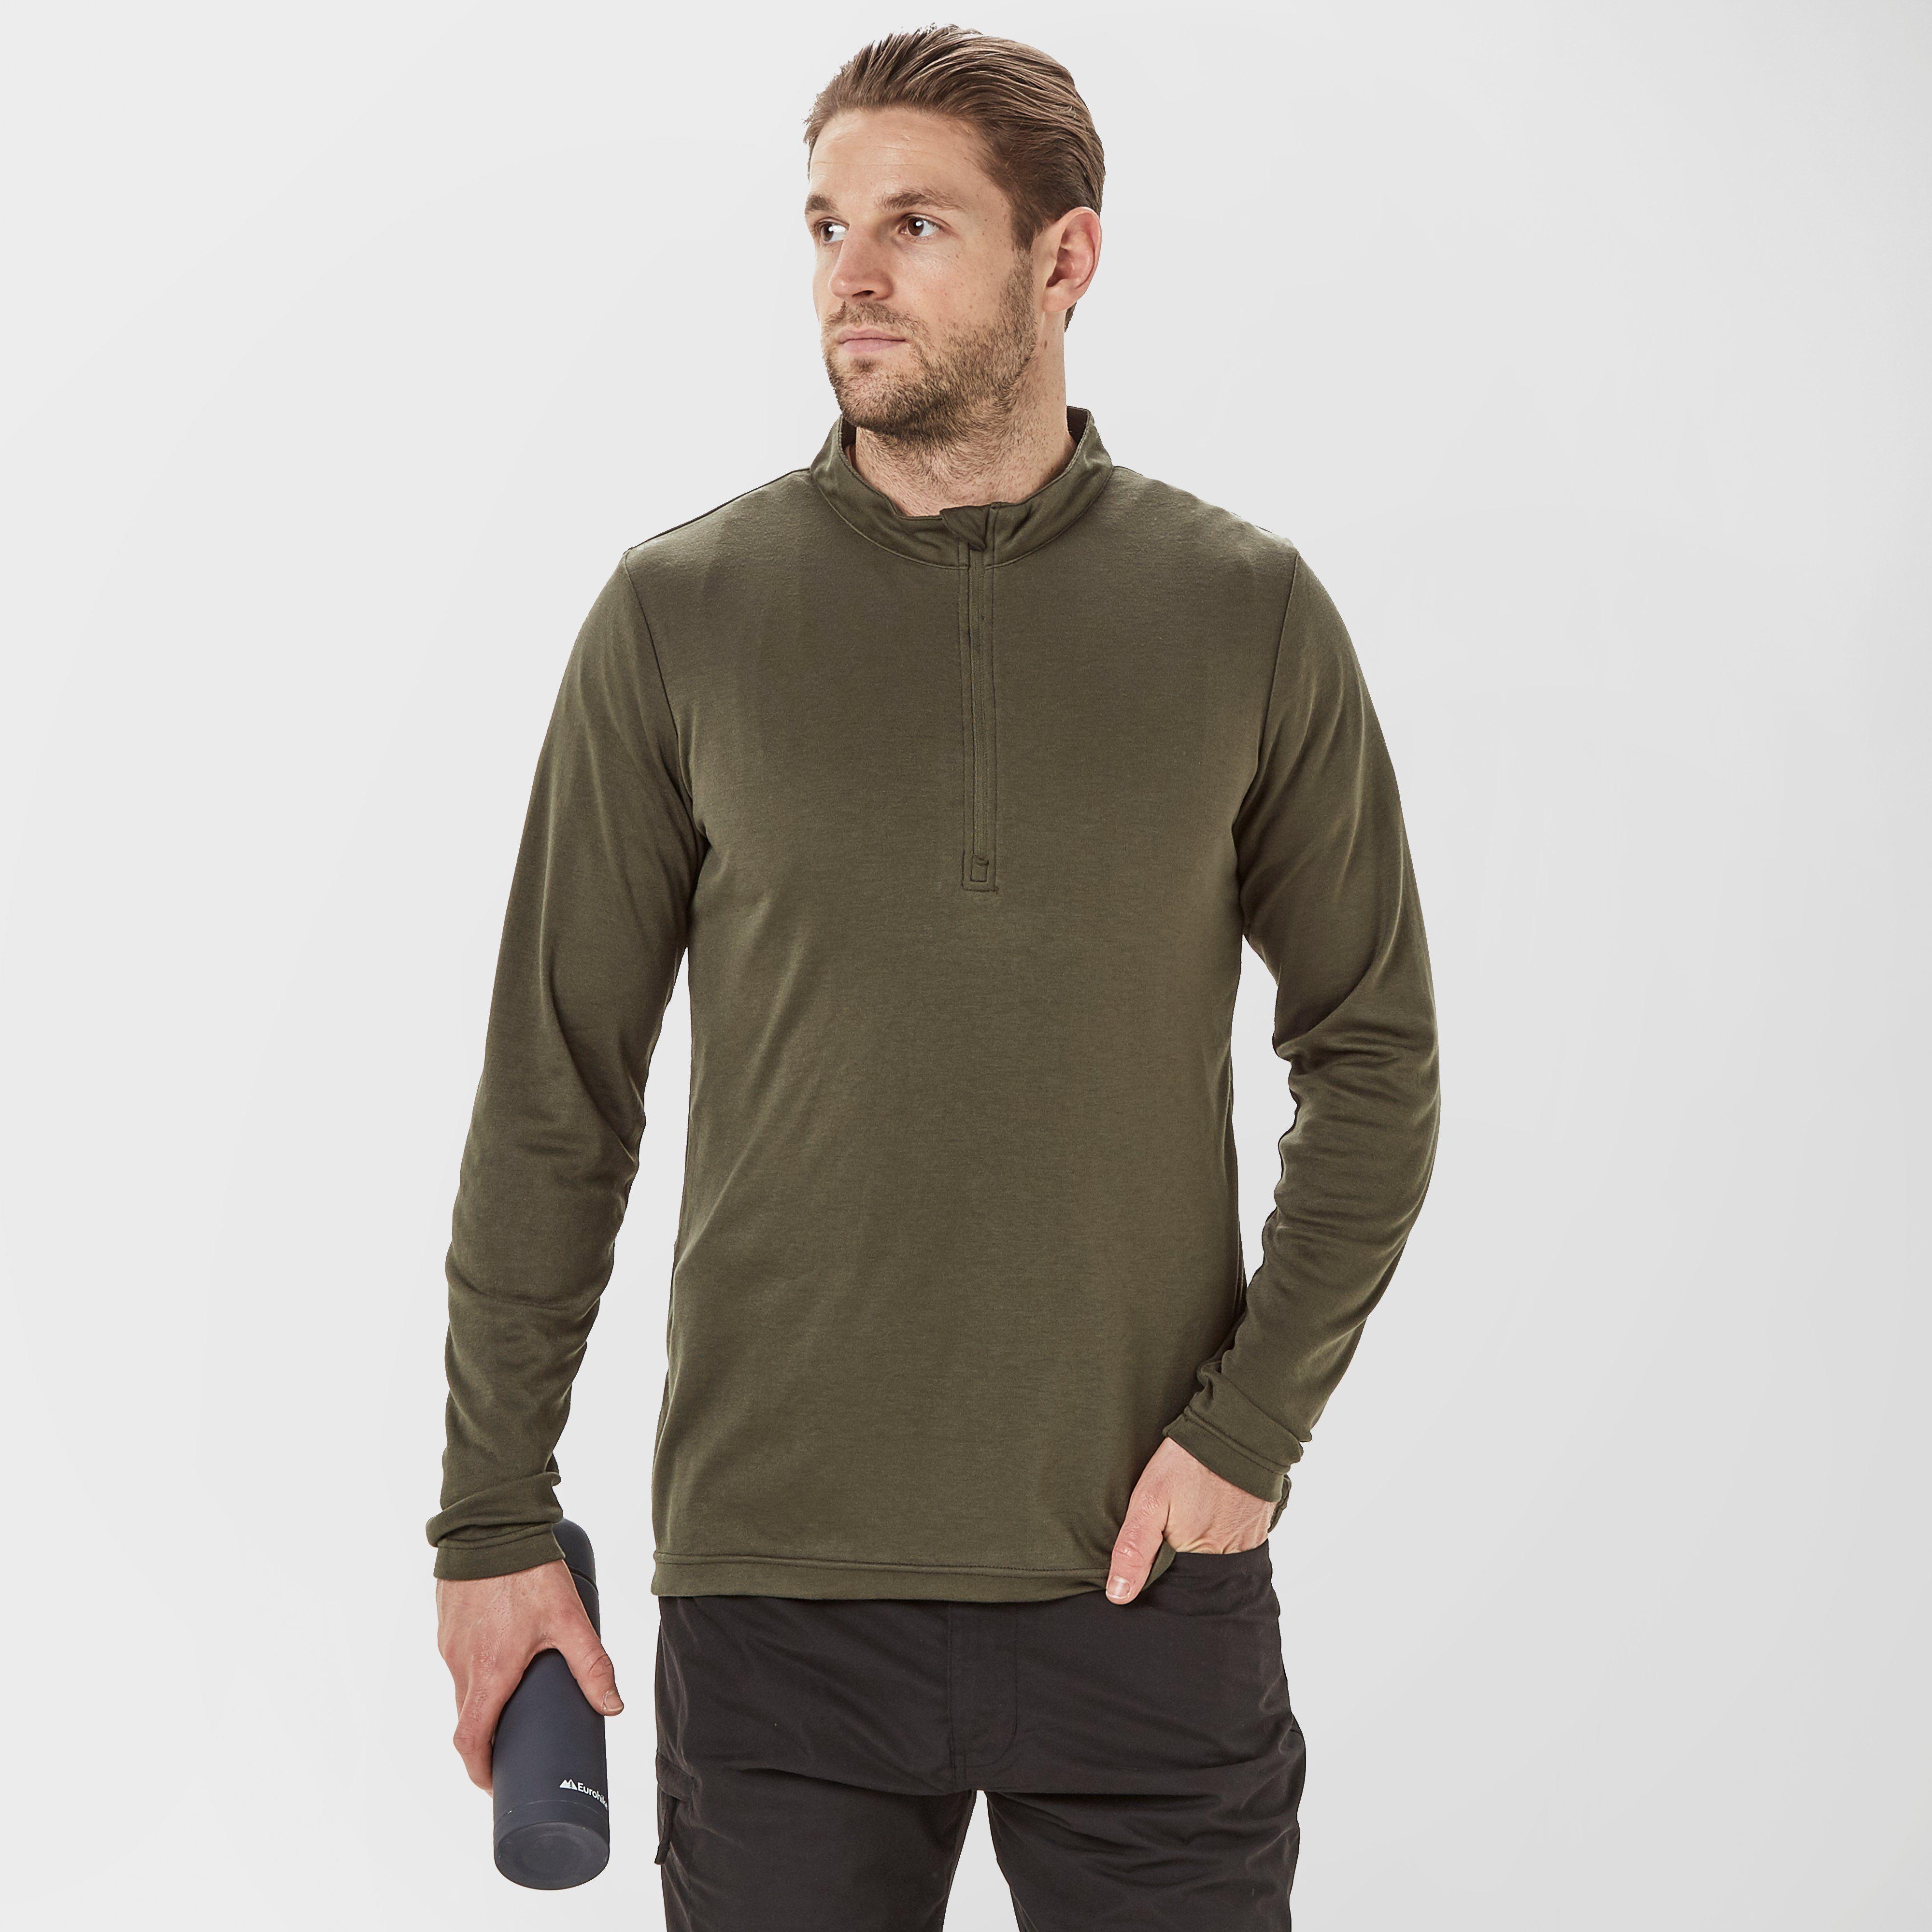 PETER STORM Men's Long Sleeve Thermal Zip Baselayer